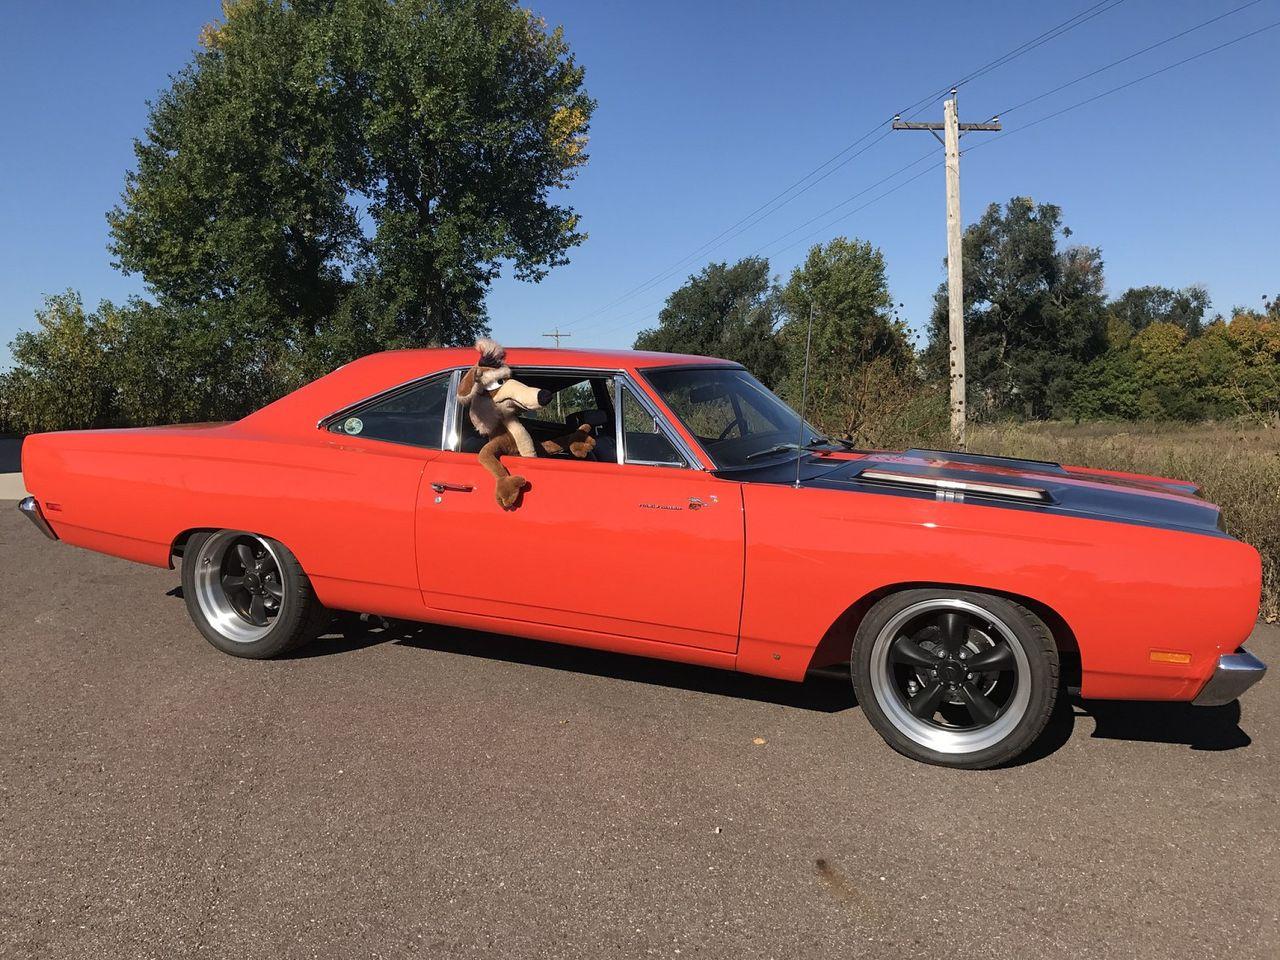 1969 Plymouth Roadrunner | Sioux Falls, SD, Orange, Rear Wheel